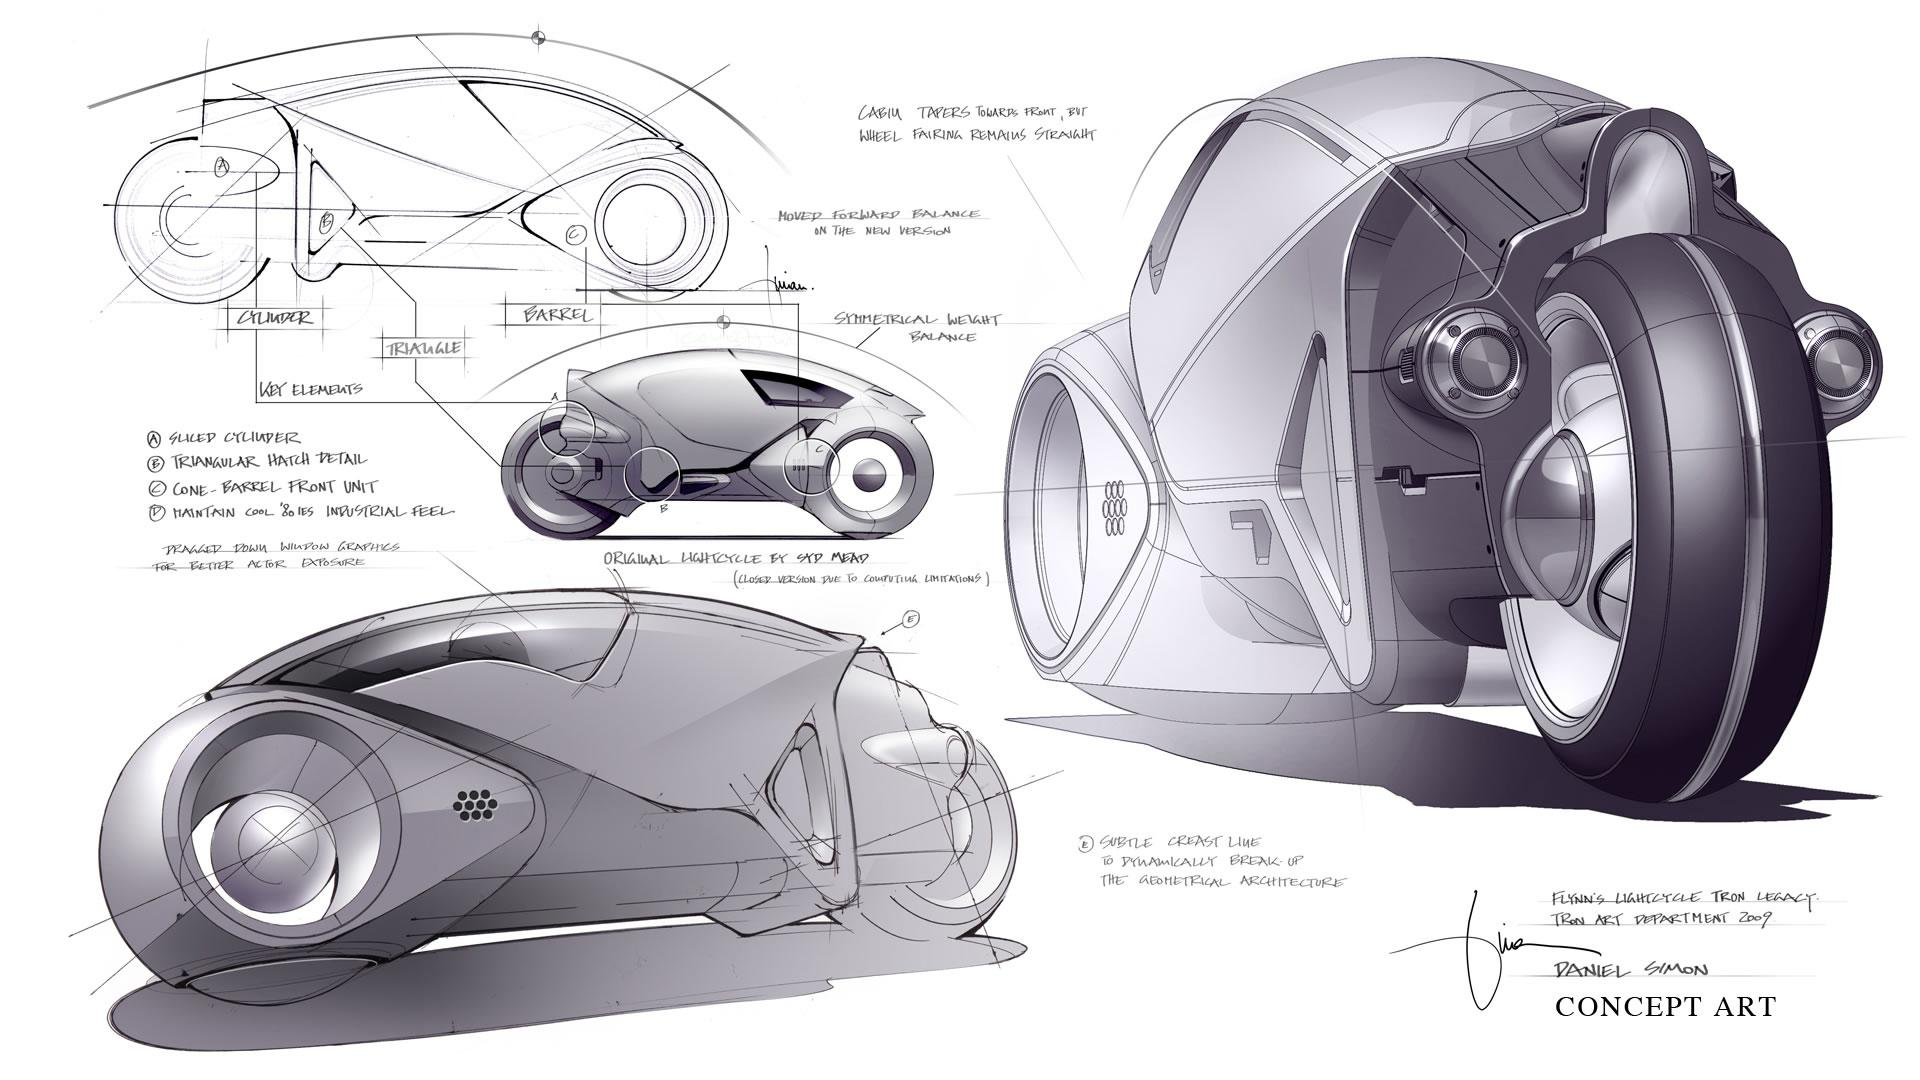 concept-artwork-Tron-Legacy-2.jpg (1920×1080)